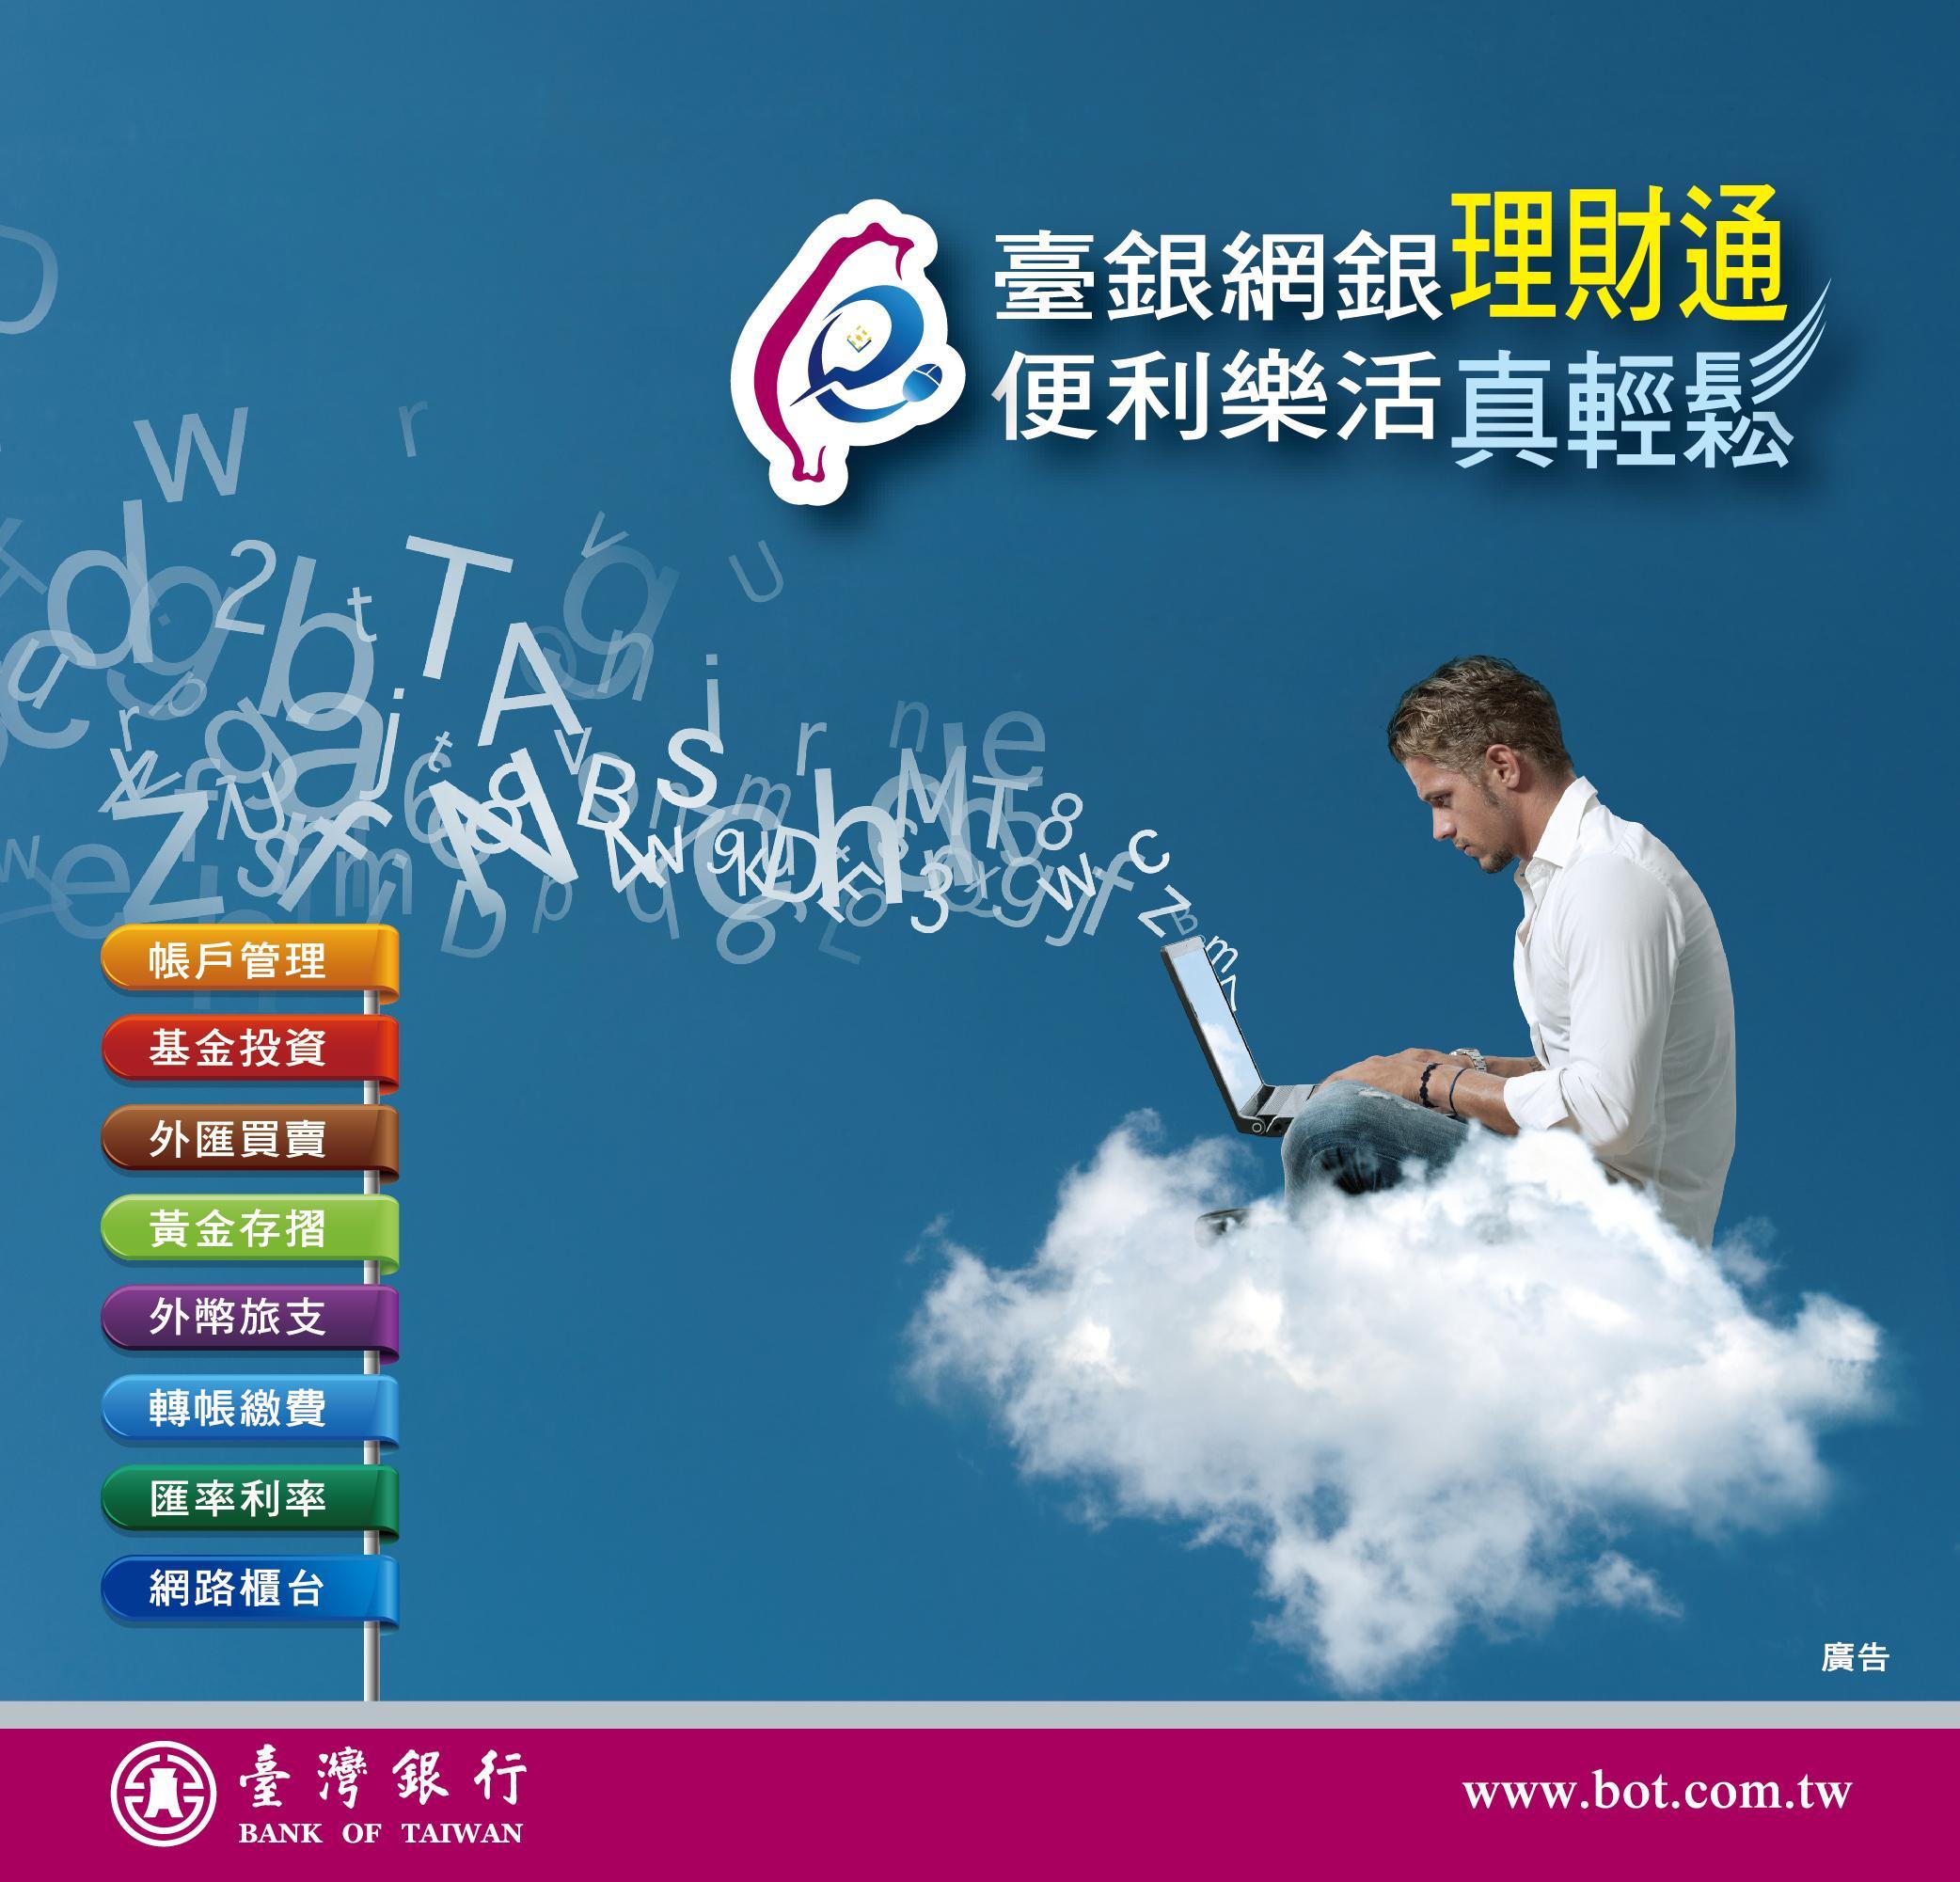 Bedste dating hjemmeside taiwan